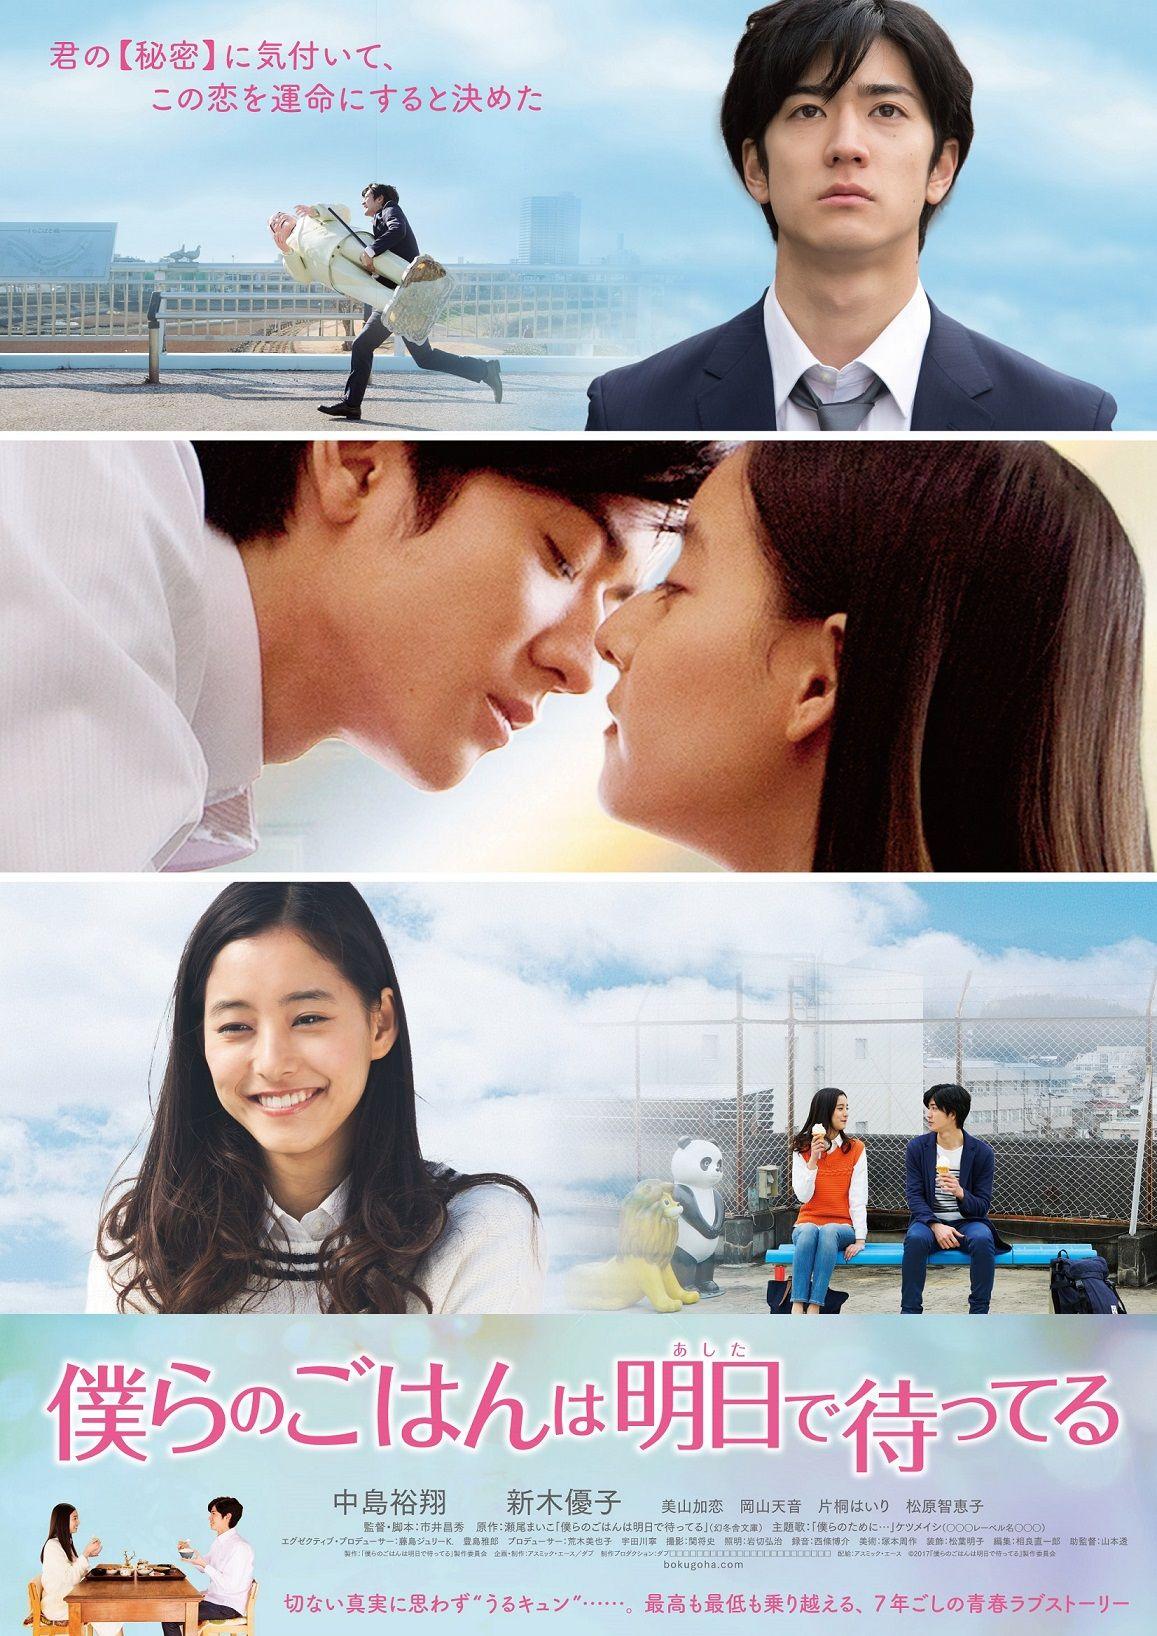 Our Meal For Tomorrow (2017) 映画, 中島裕翔, 日本のドラマ